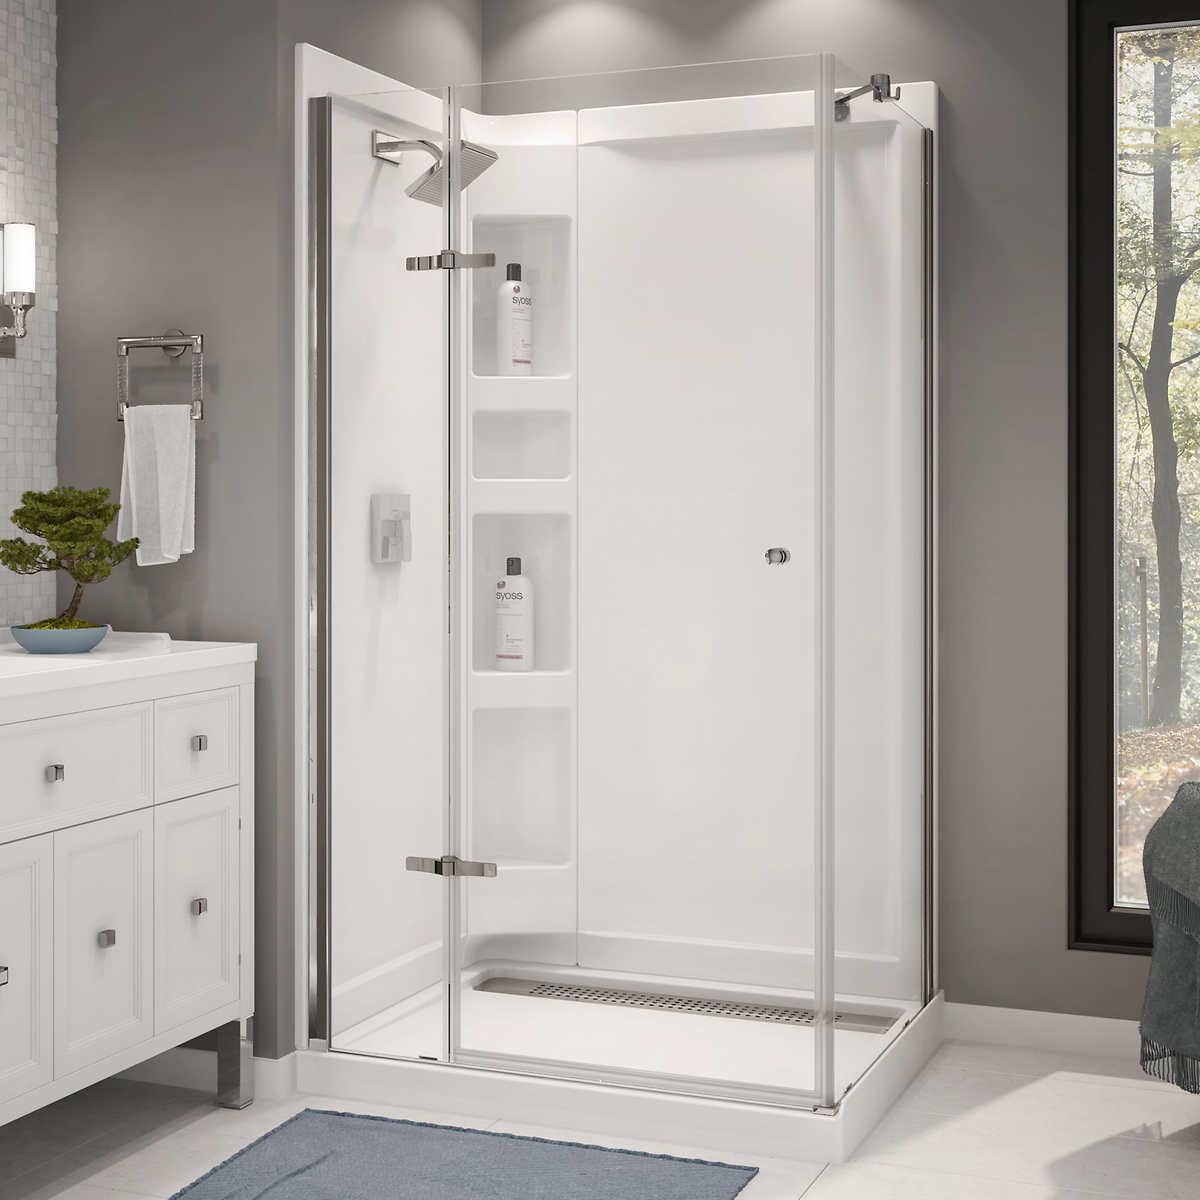 showers costco maax athena corner shower kit